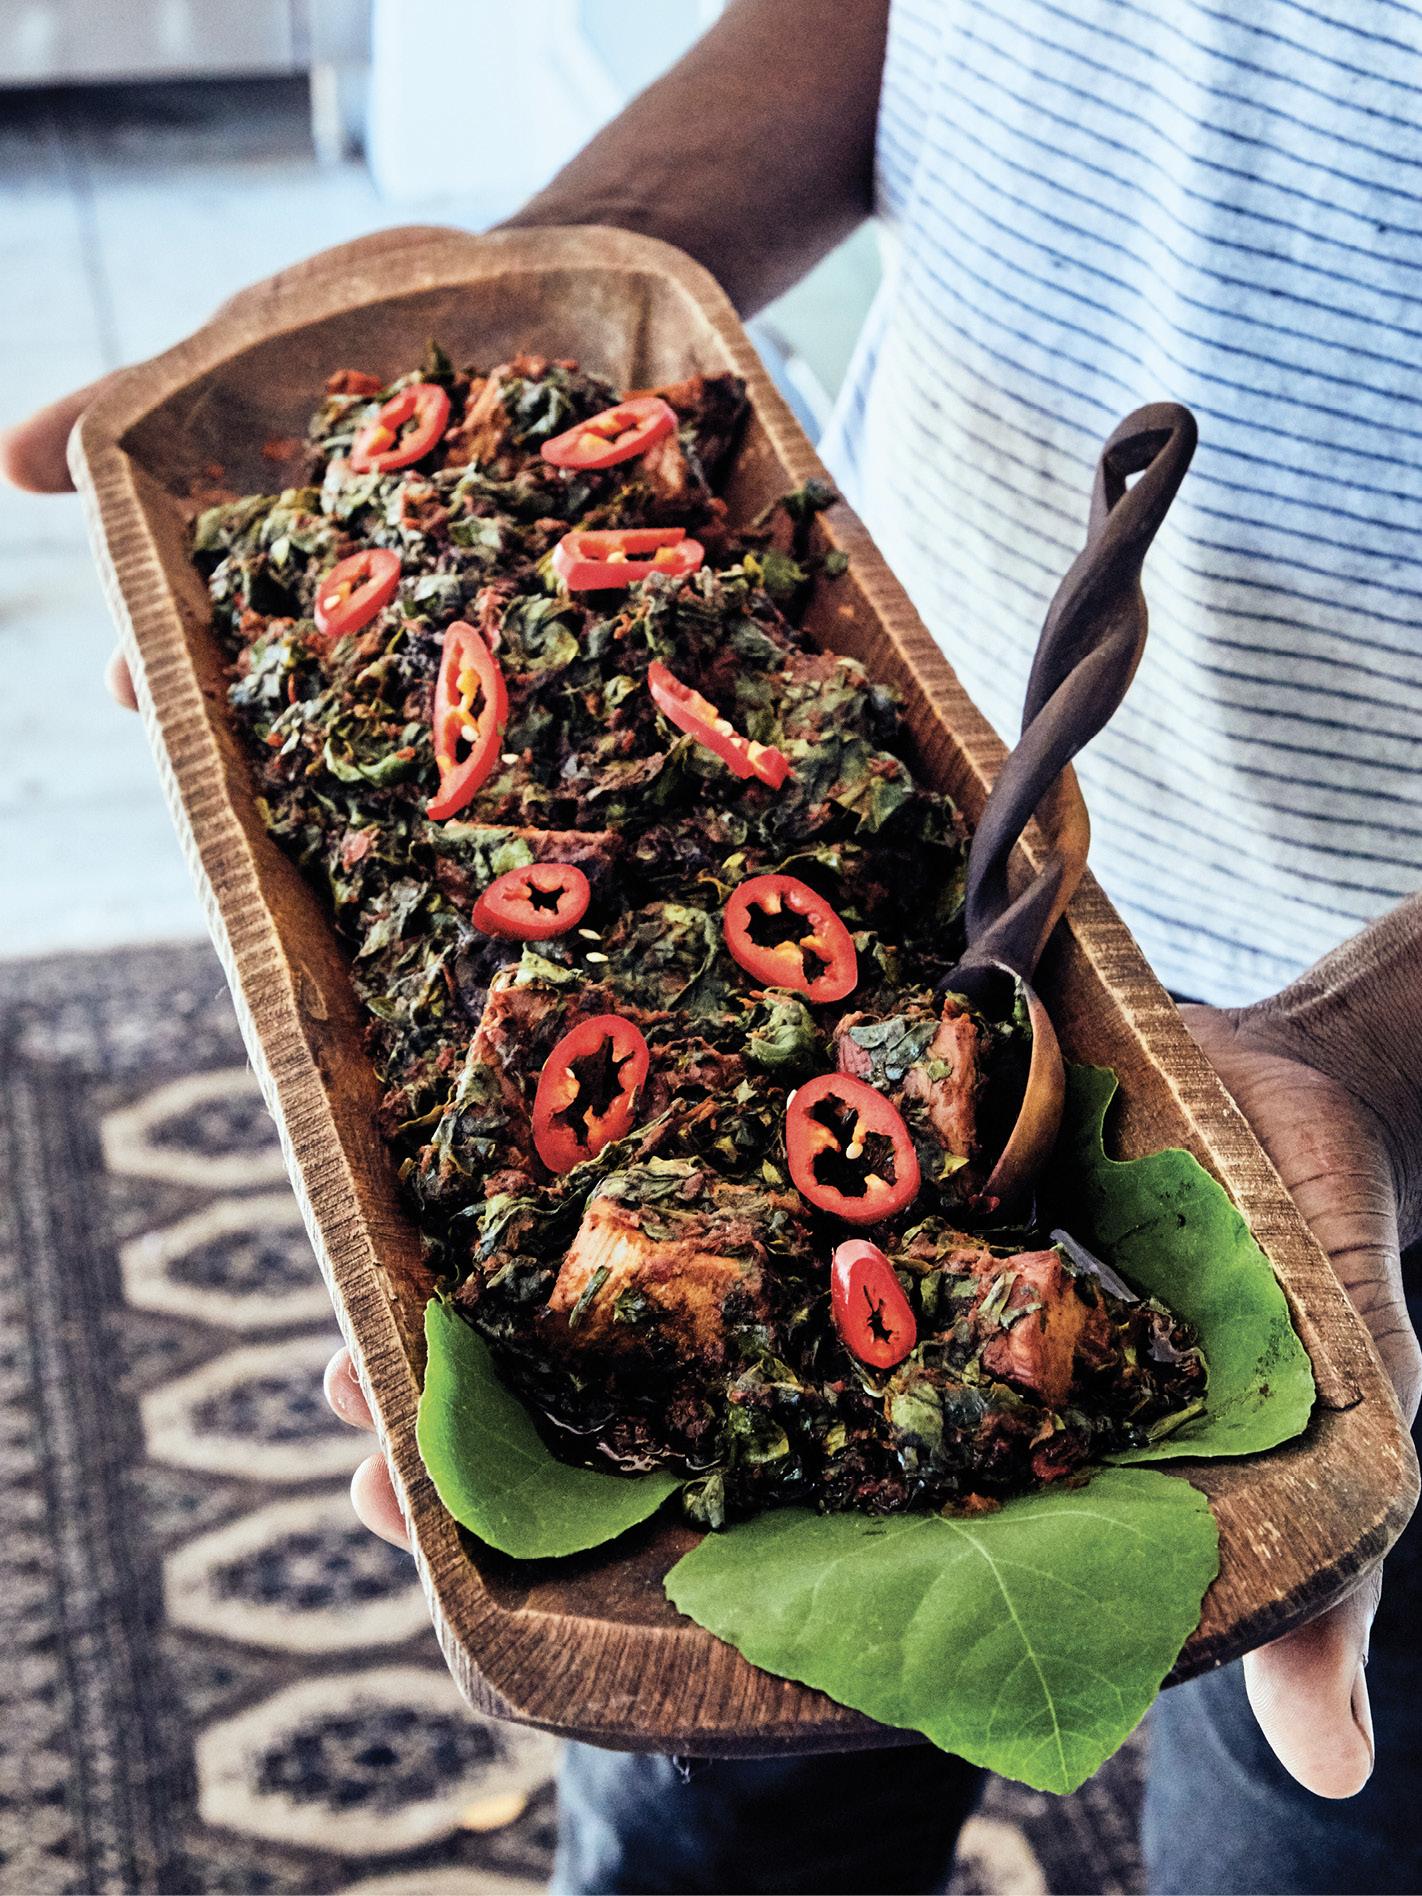 Efo riro, a Yoruba-style spinach stew